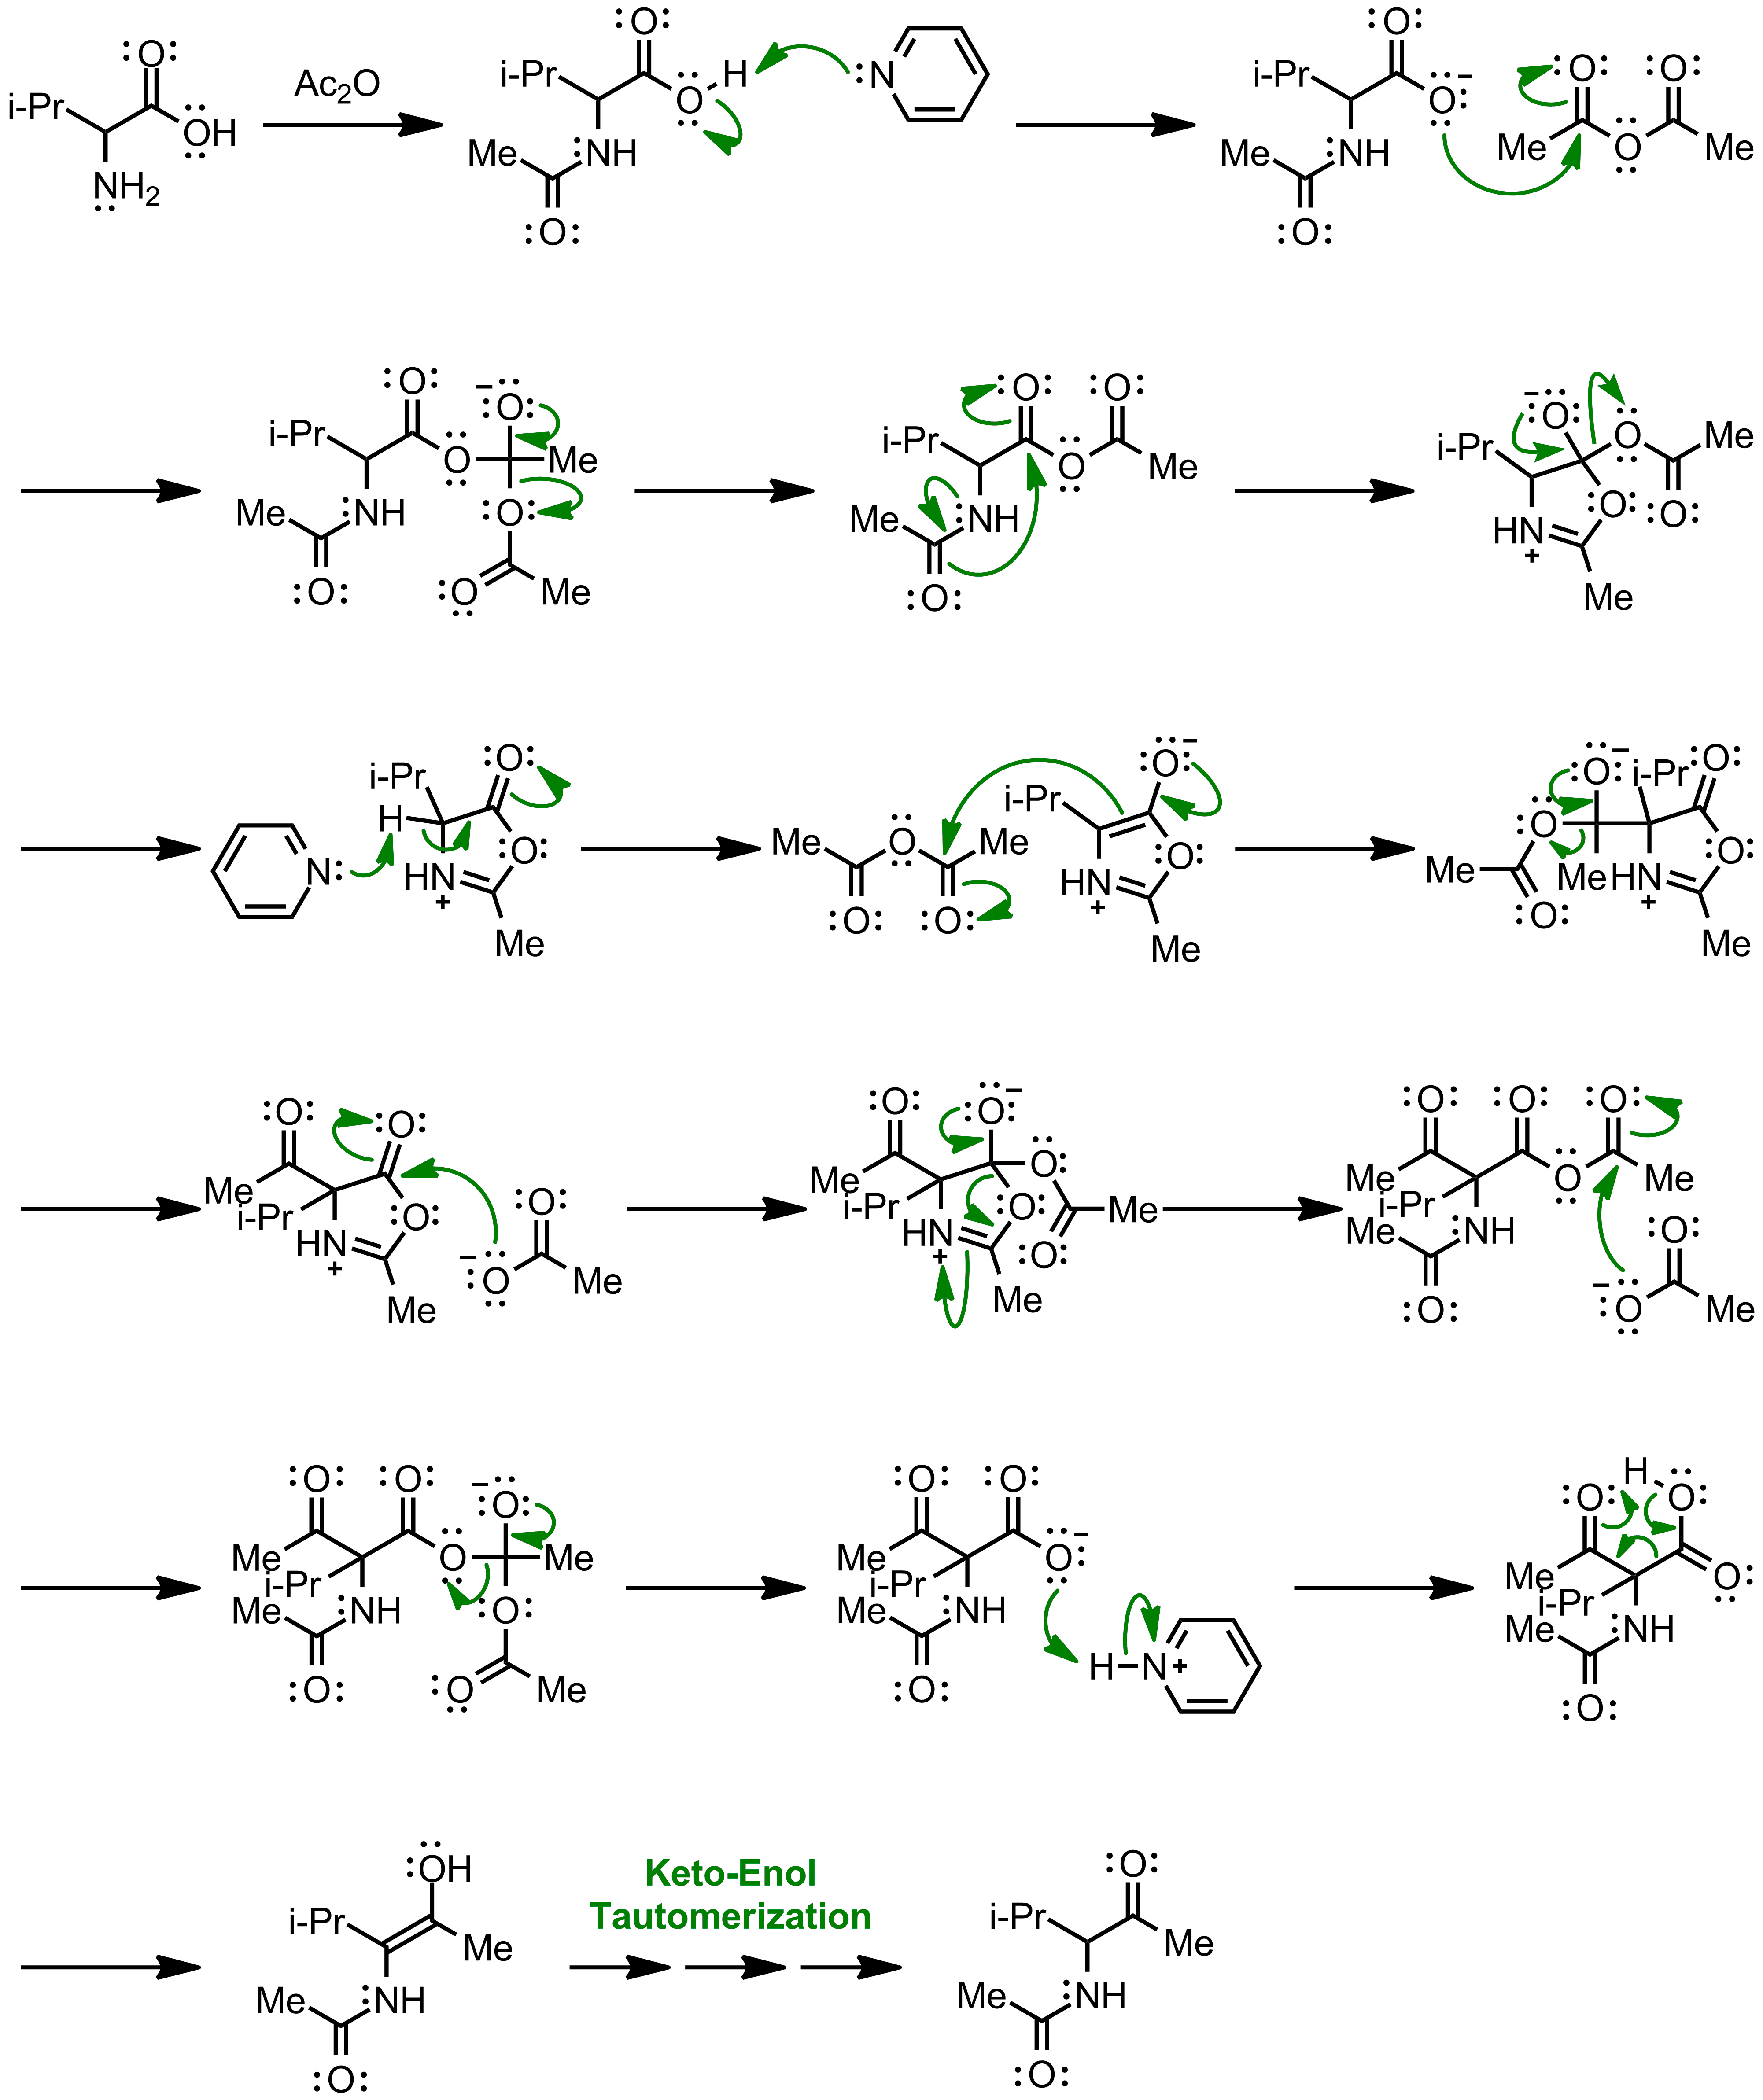 Mechanism of the Dakin-West Reaction